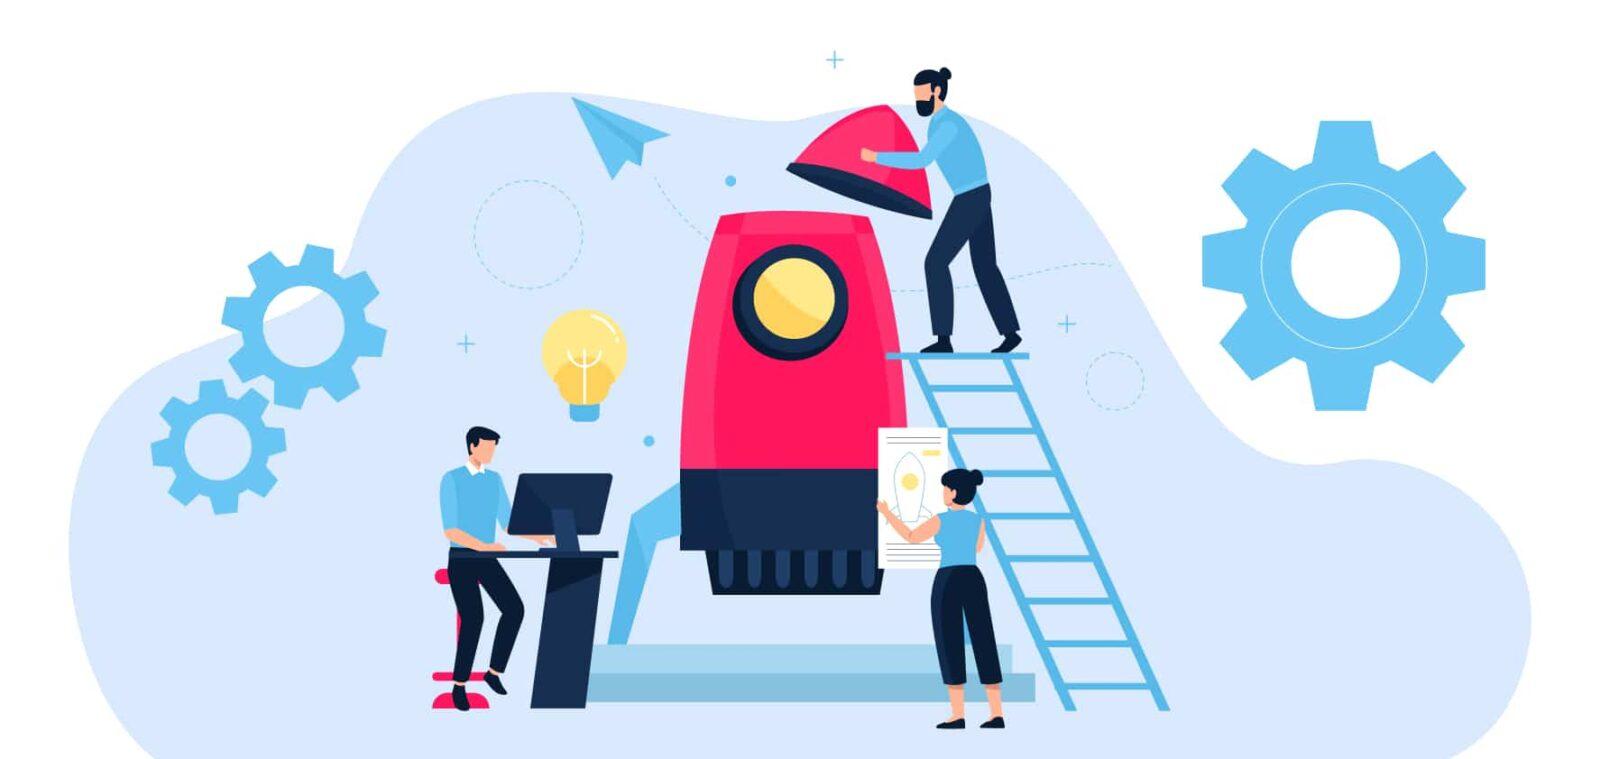 Ways to Evaluate a Business Idea